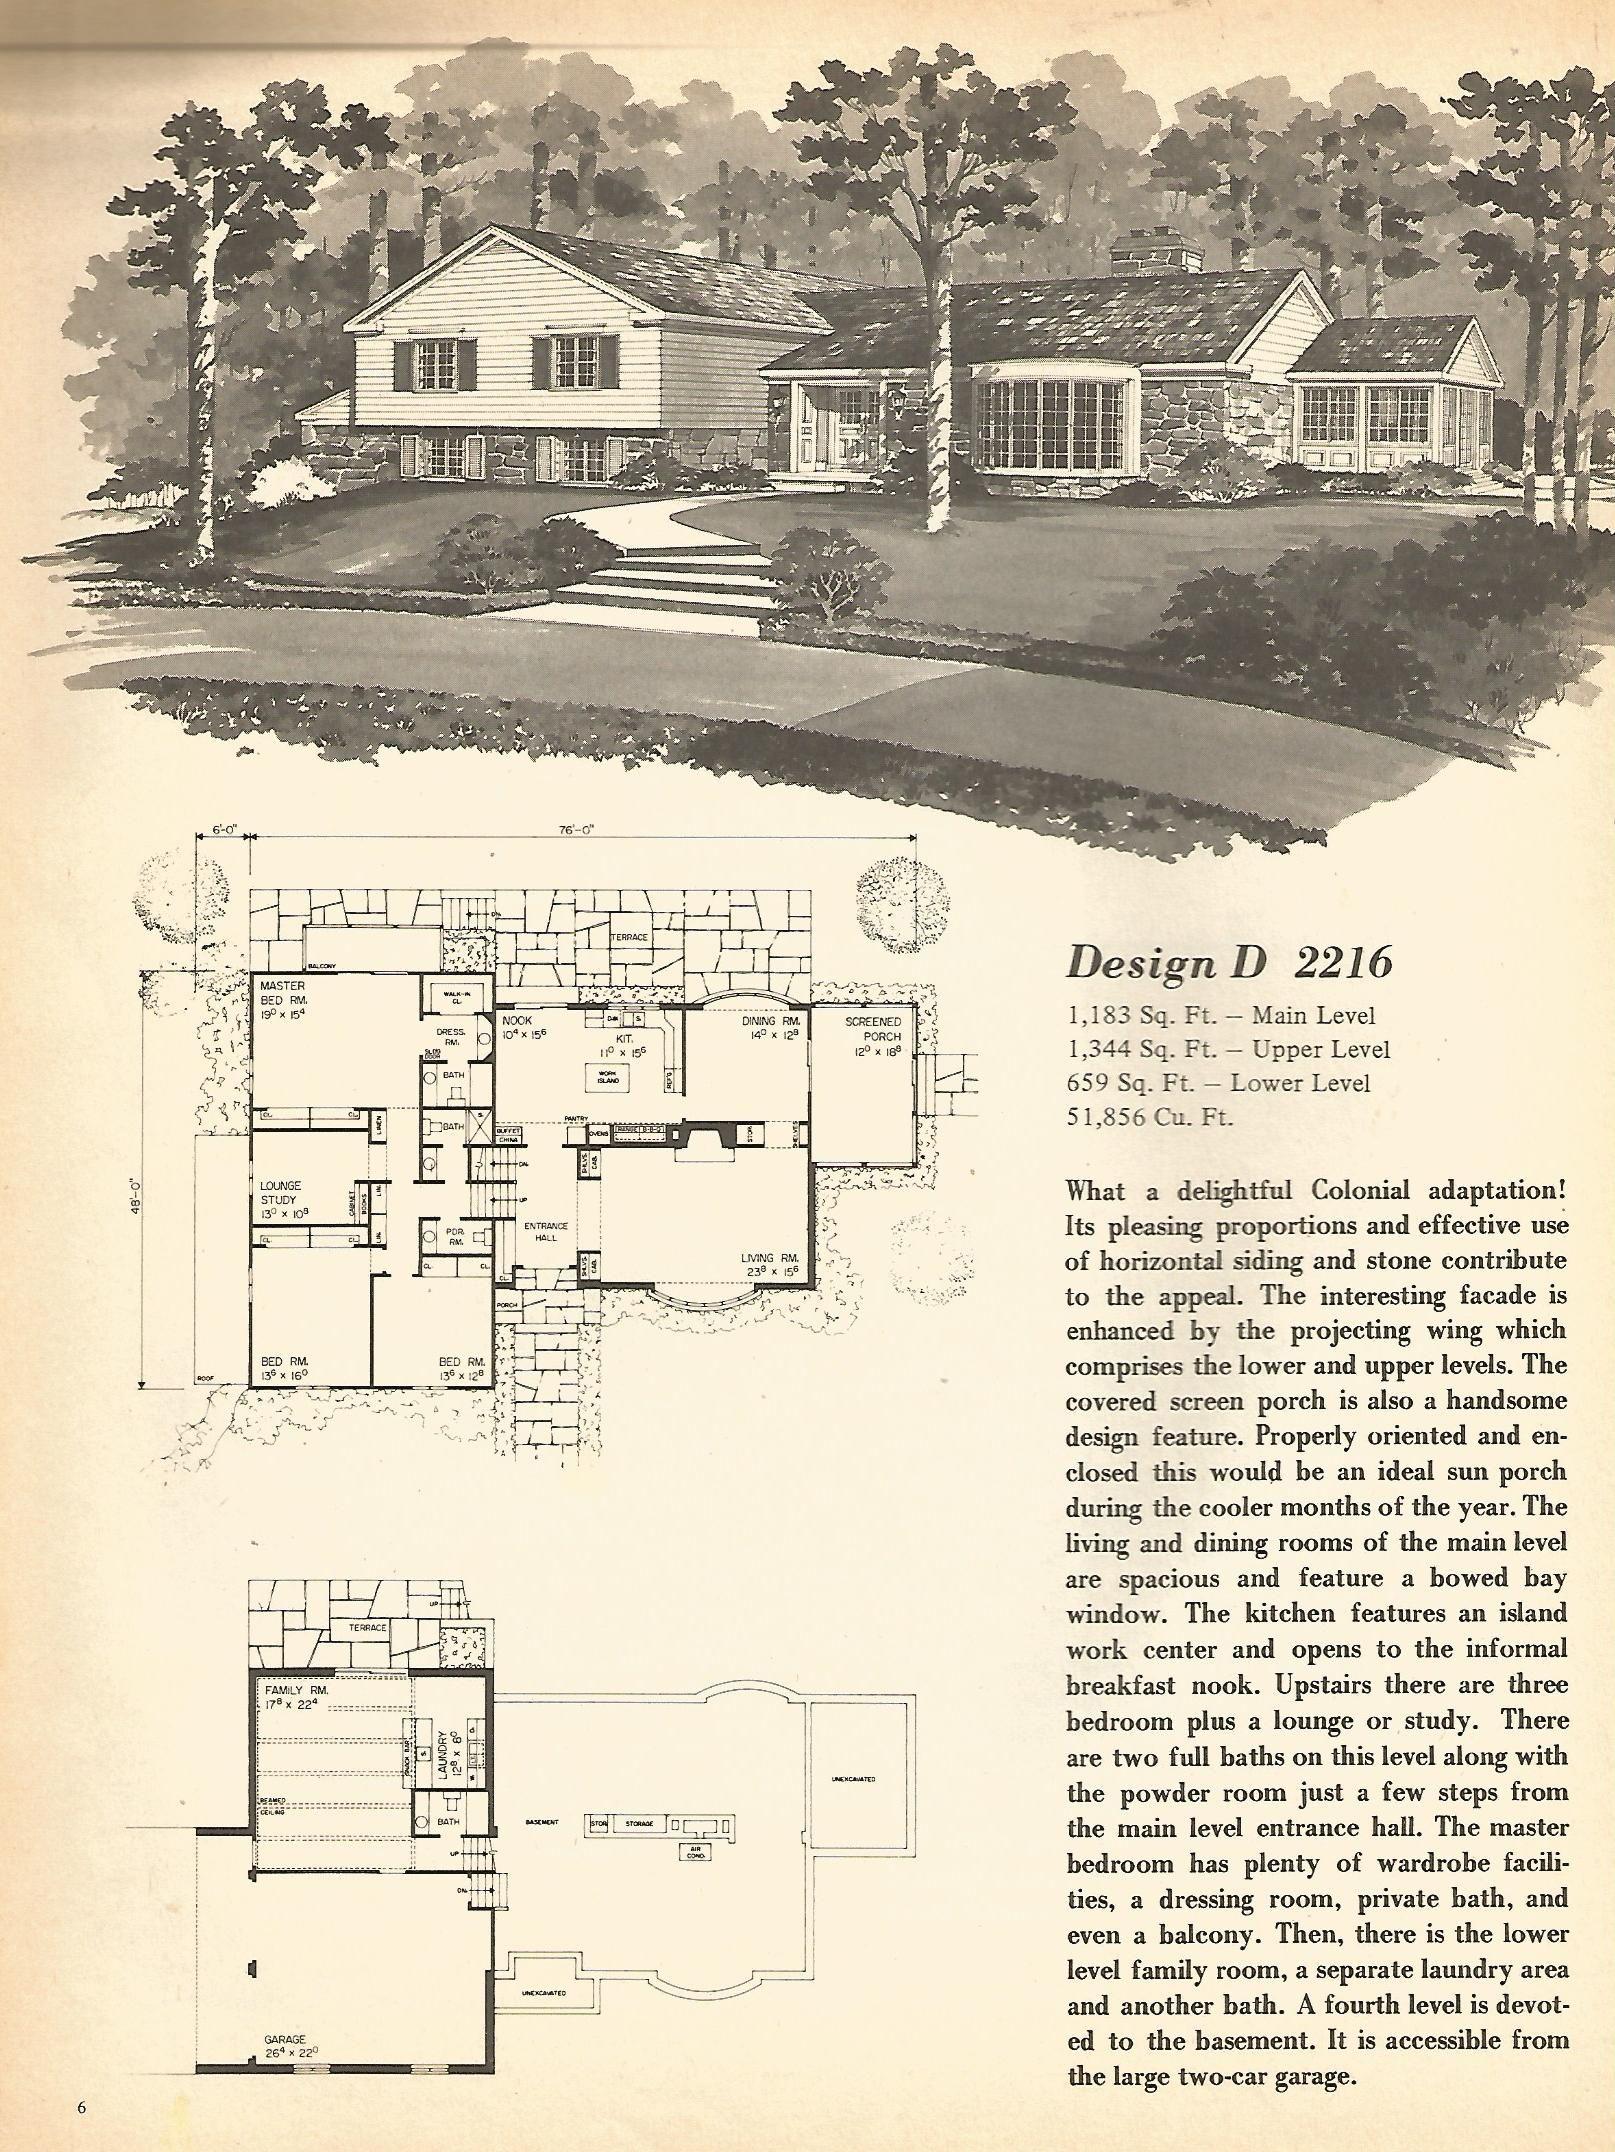 vintage house plans mid century homes split level homes vintage house plans mid century homes split level homes